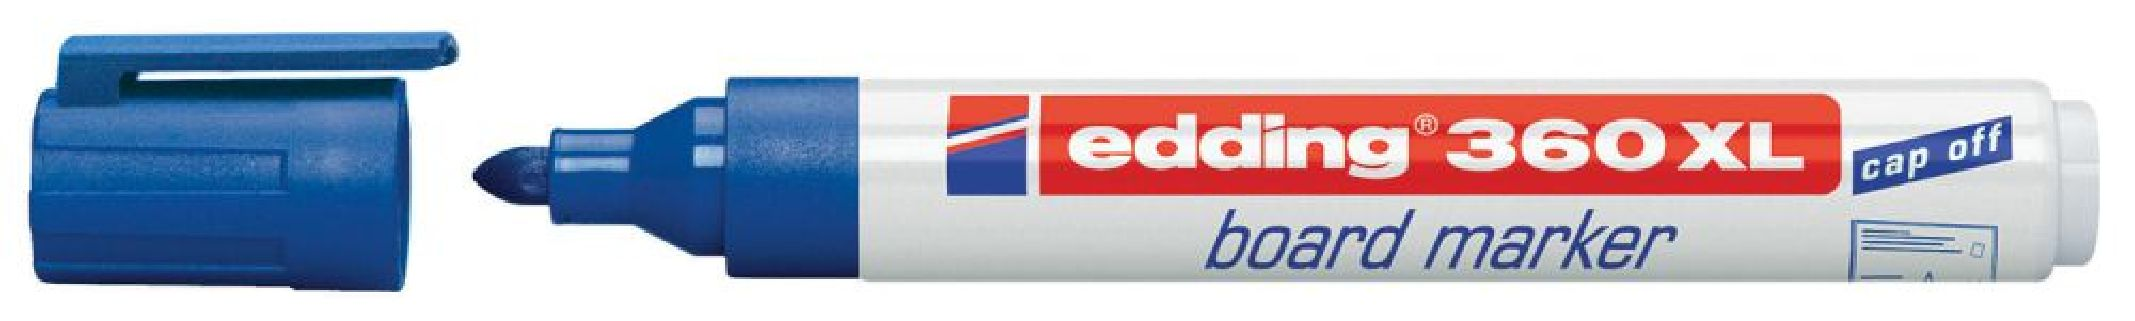 edding-360-xl-garantiofis